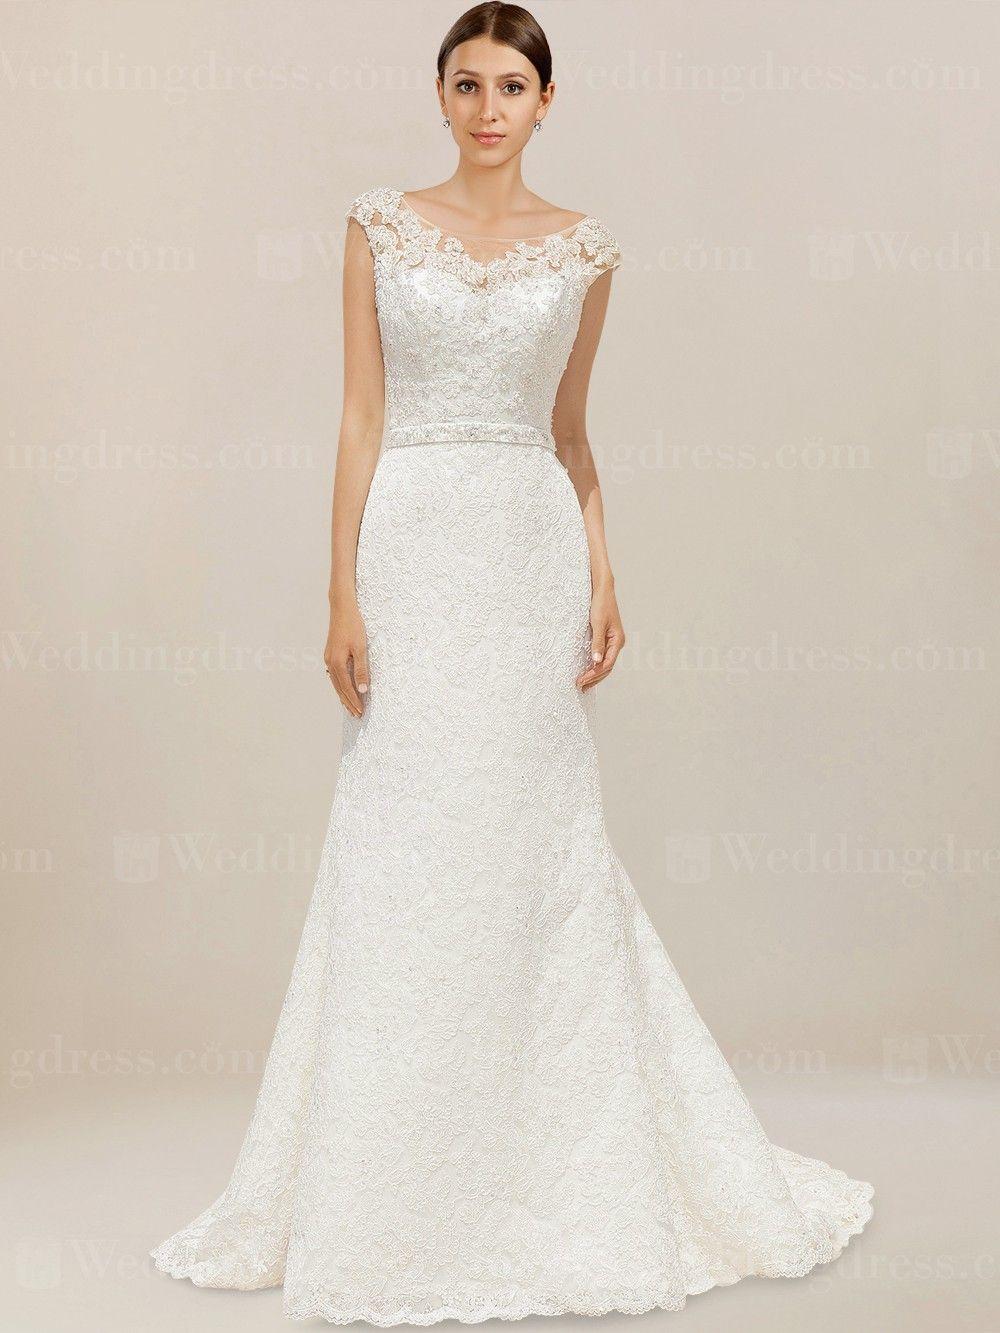 Lace cap sleeve wedding dress lc bateau neckline wedding dress